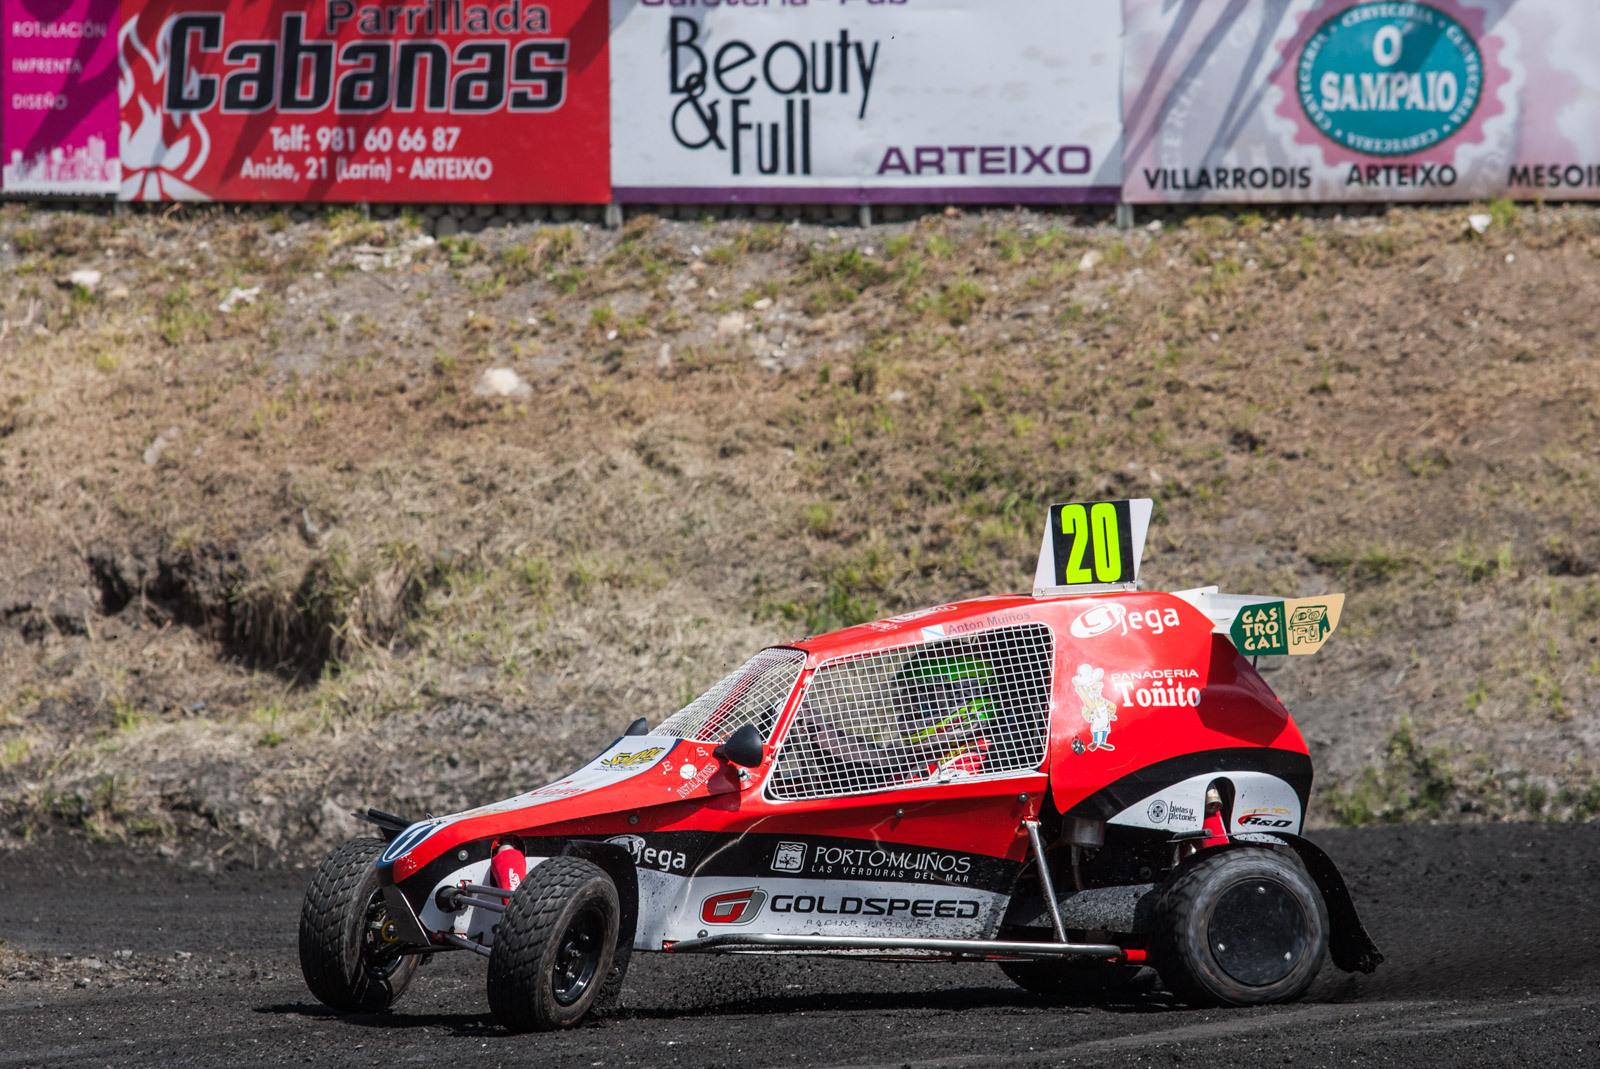 003 Autocross Arteixo FGA Abril 2016 012